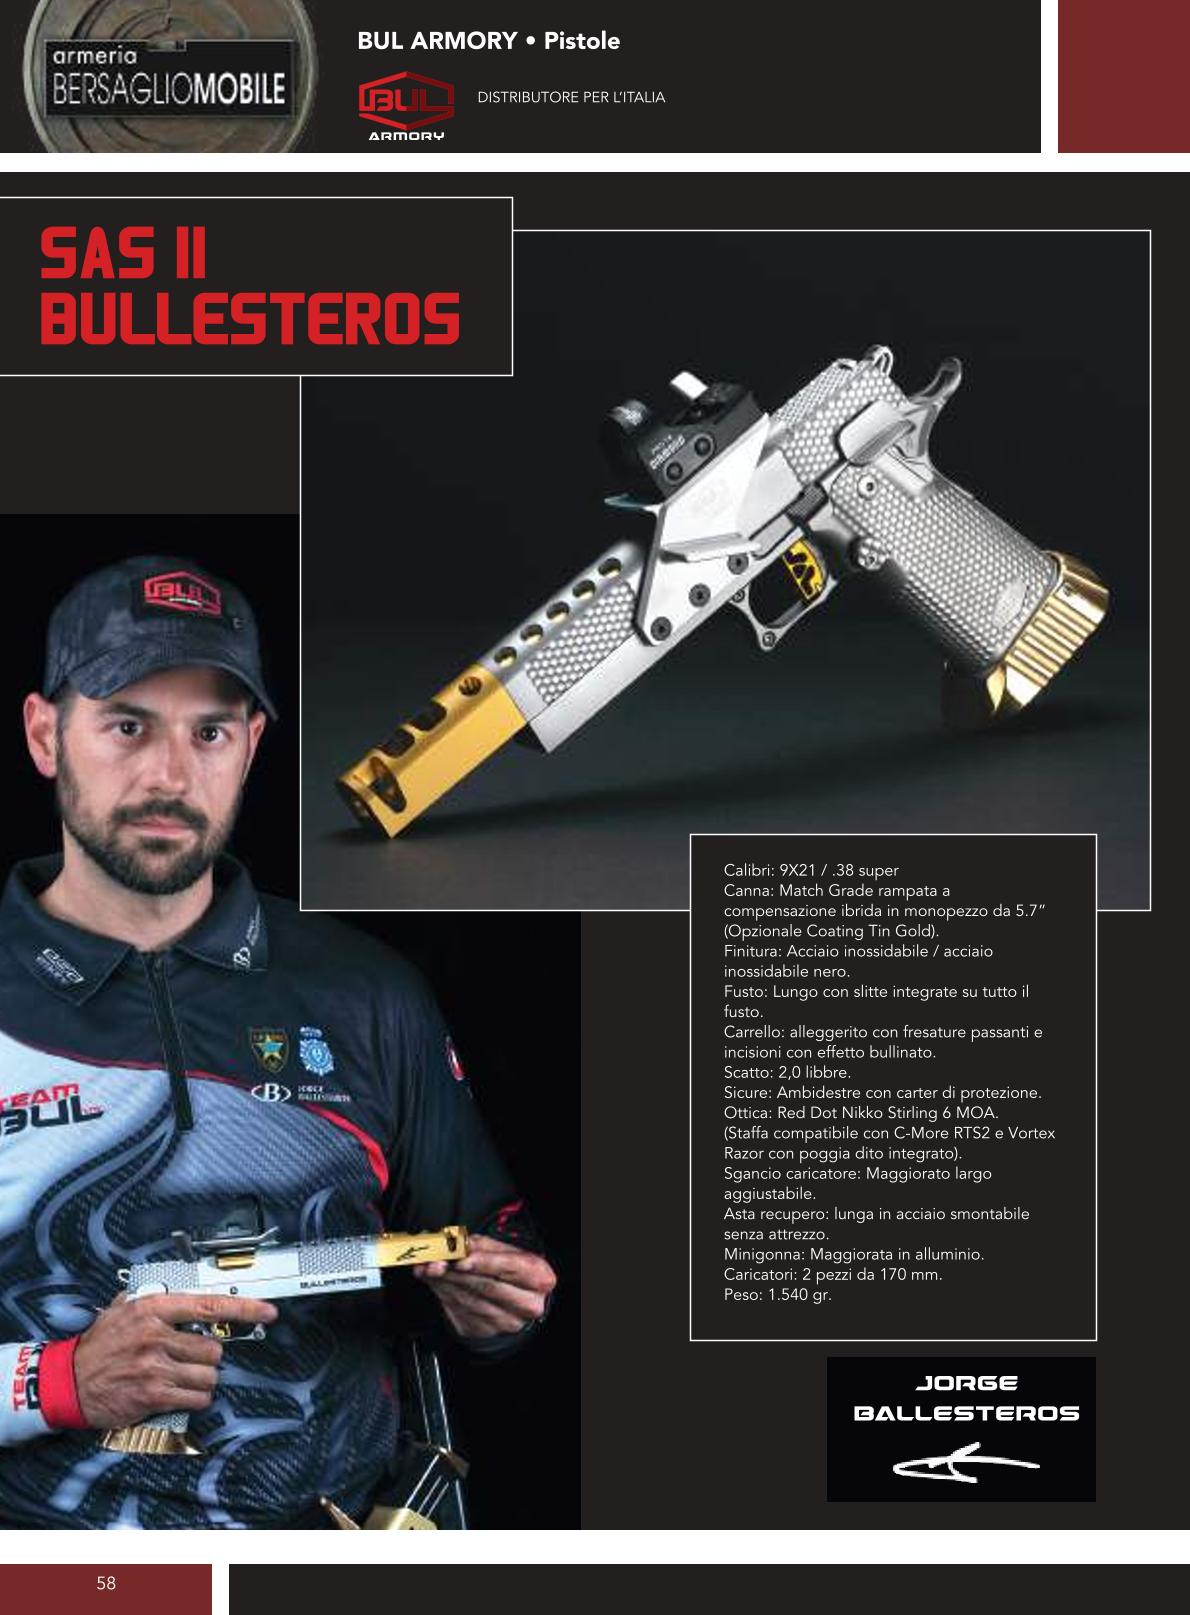 Bul Armory - Sas II Bullesteros - Armeria Bersaglio Mobile